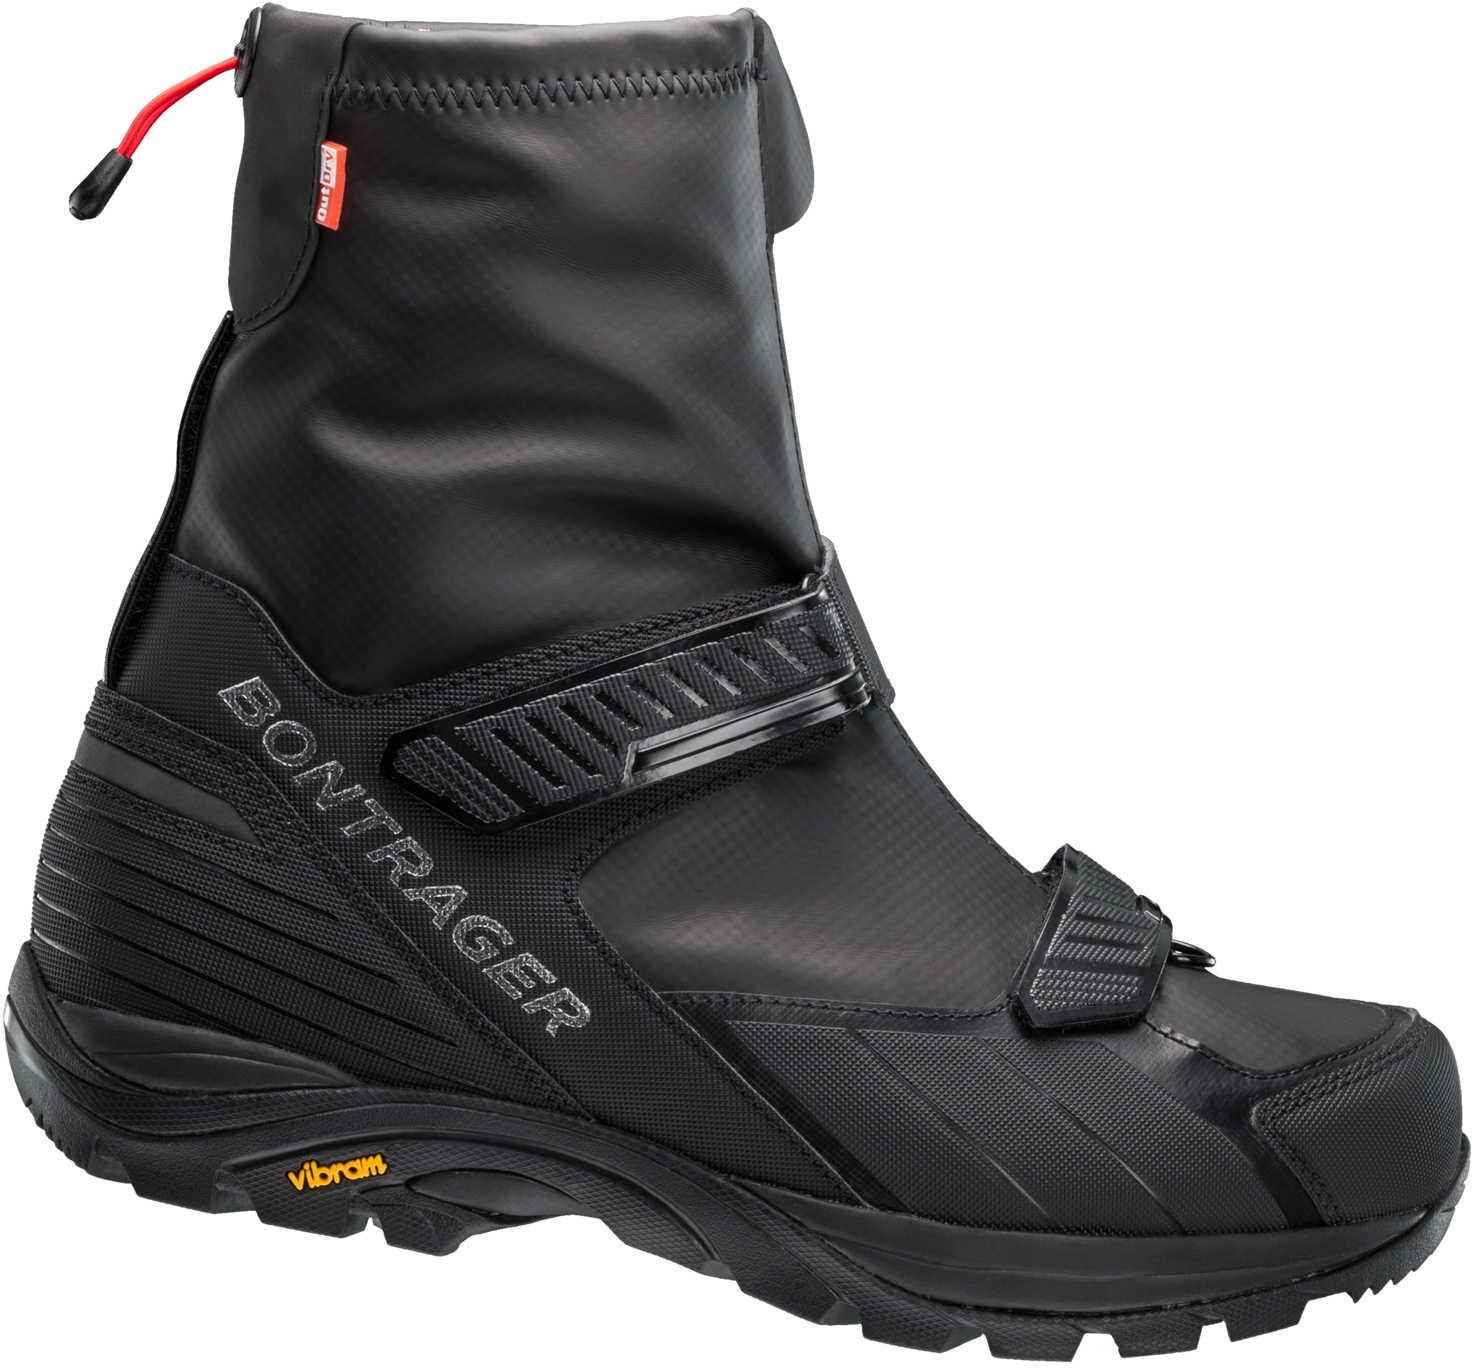 Bontrager OMW Winter Shoes Black